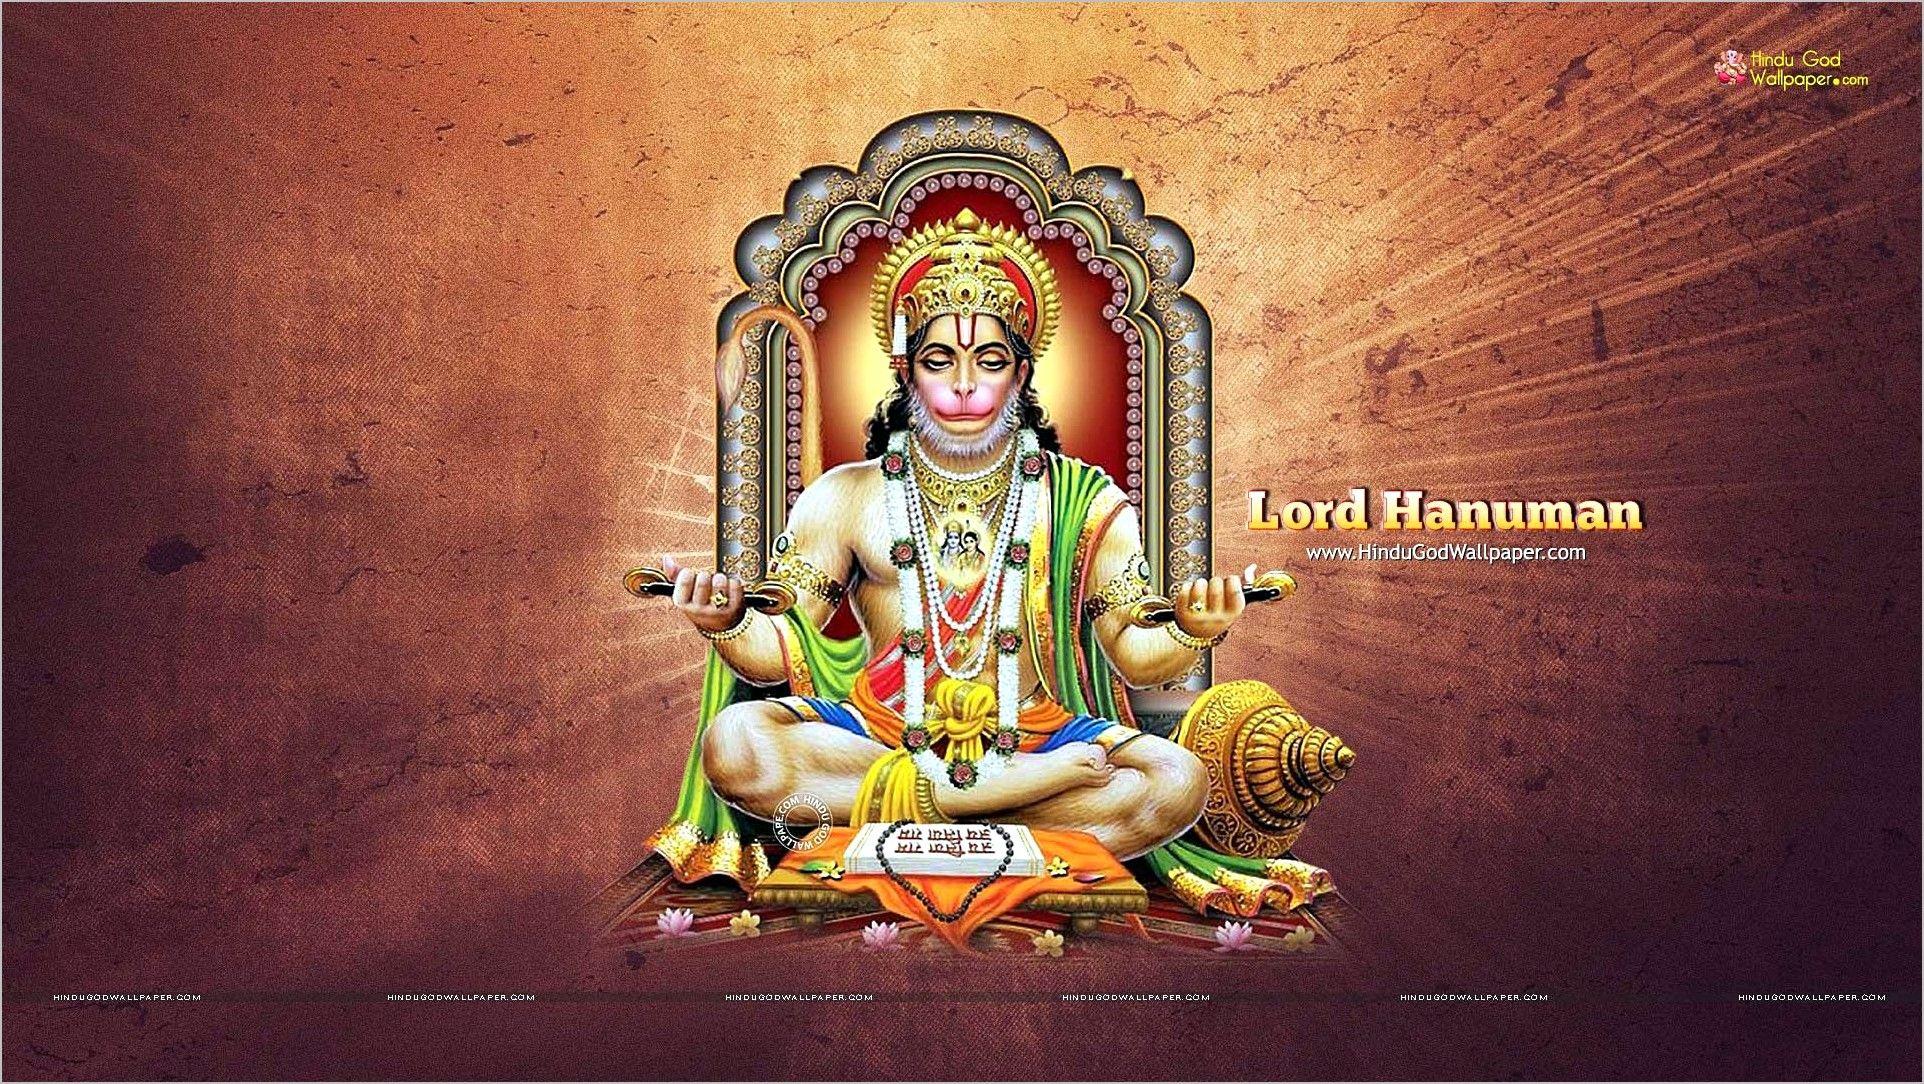 4k Wallpaper Of Hindu God Hanuman Hd Wallpaper Hanuman Wallpaper Lord Hanuman Wallpapers